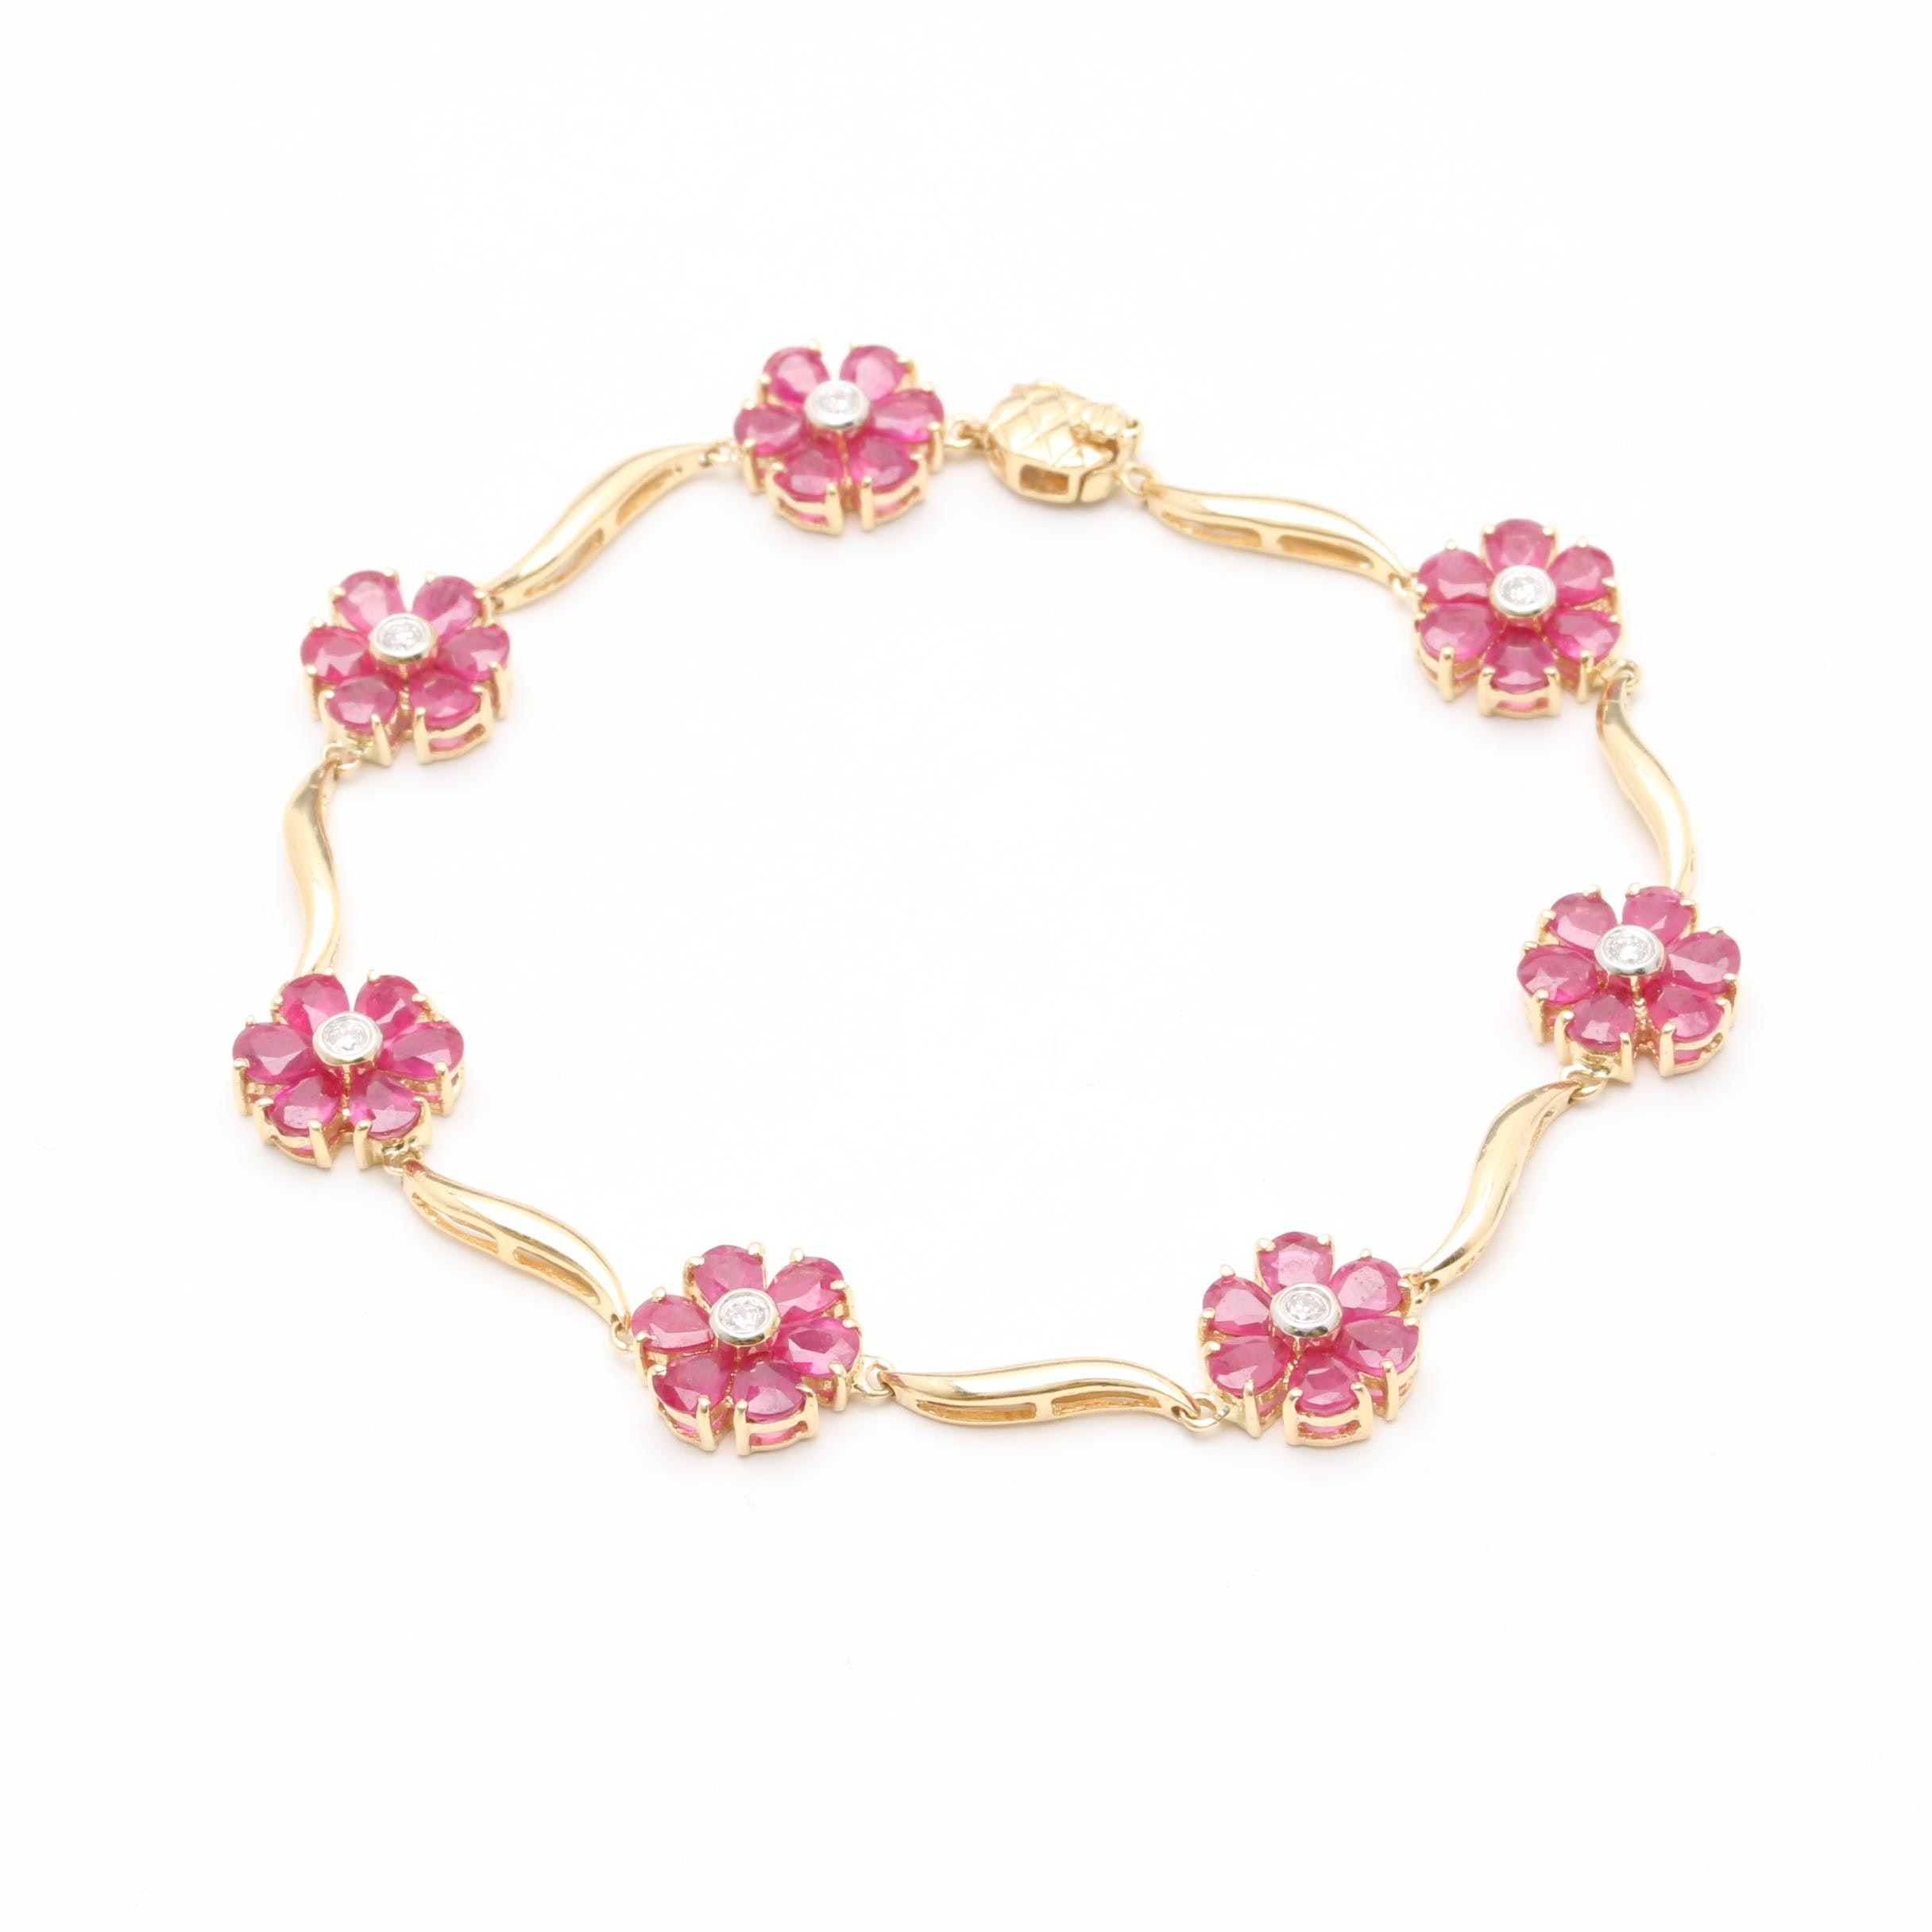 14K Yellow Gold Diamond and Ruby Flower Bracelet